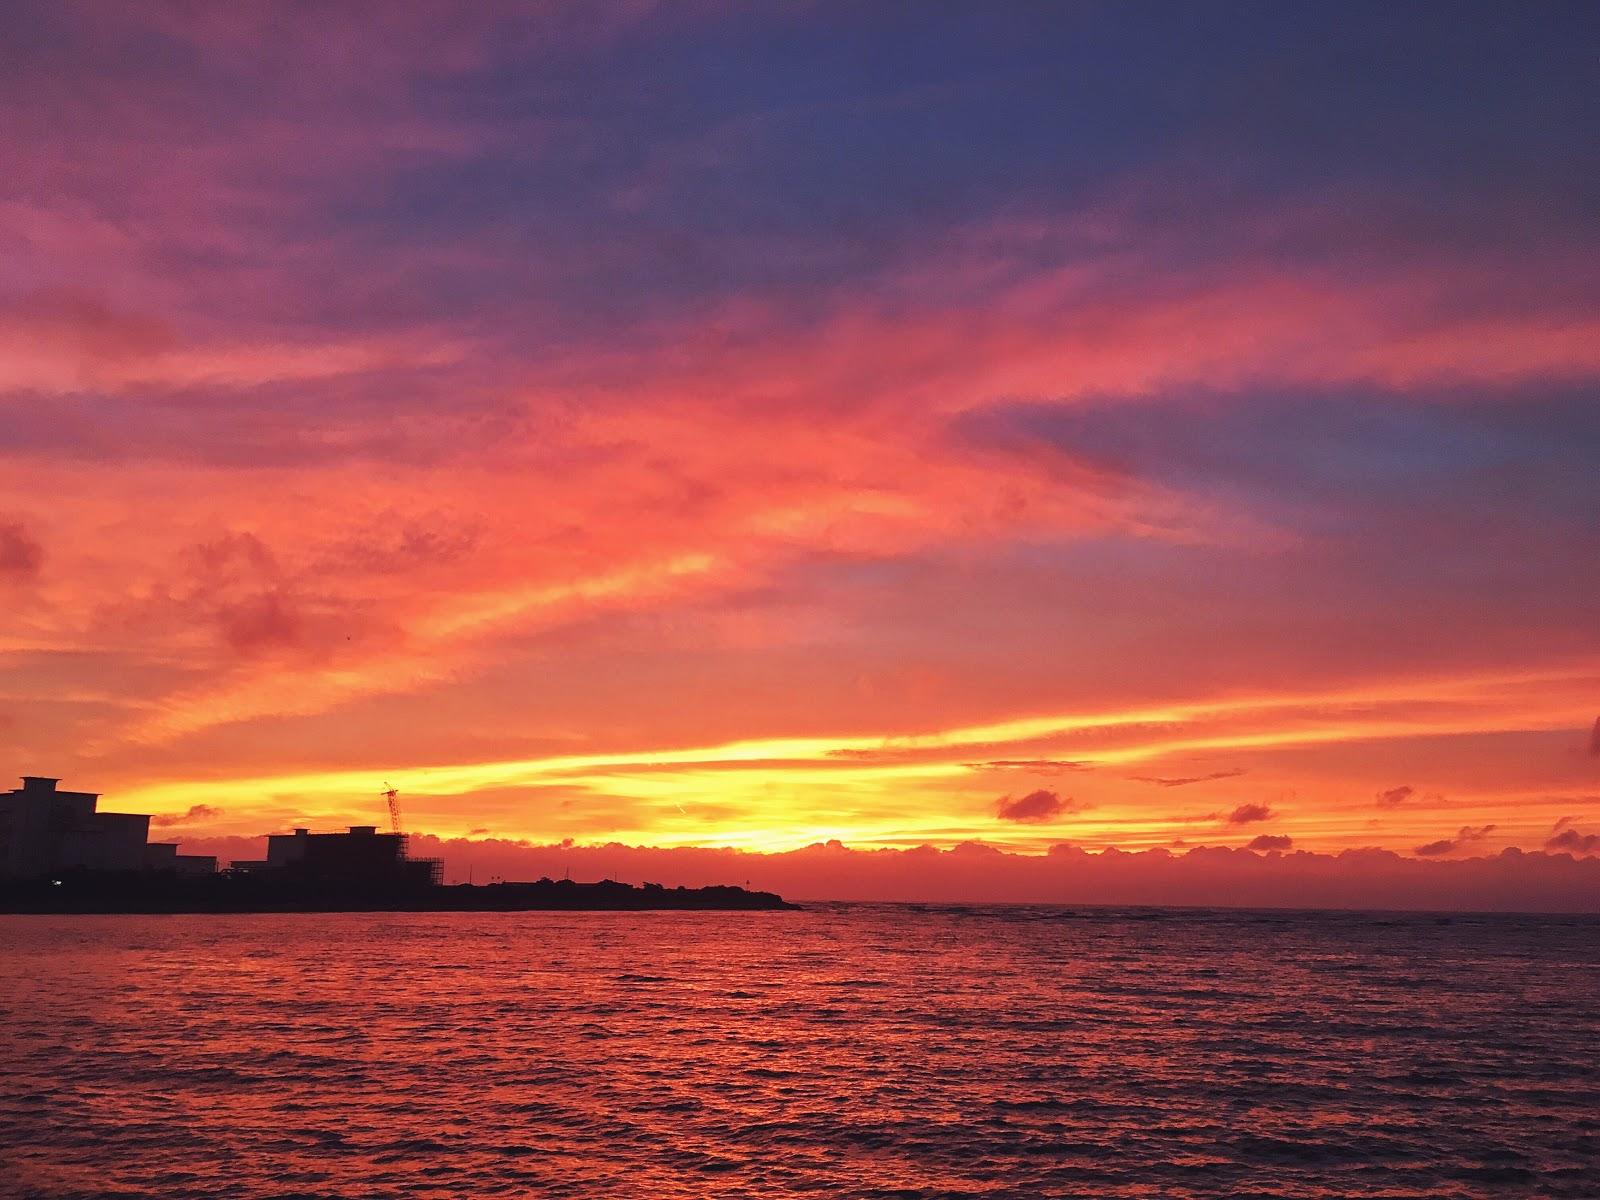 okinawa, ginowan, east china sea, sunset, sky, araha beach, japan, ocean